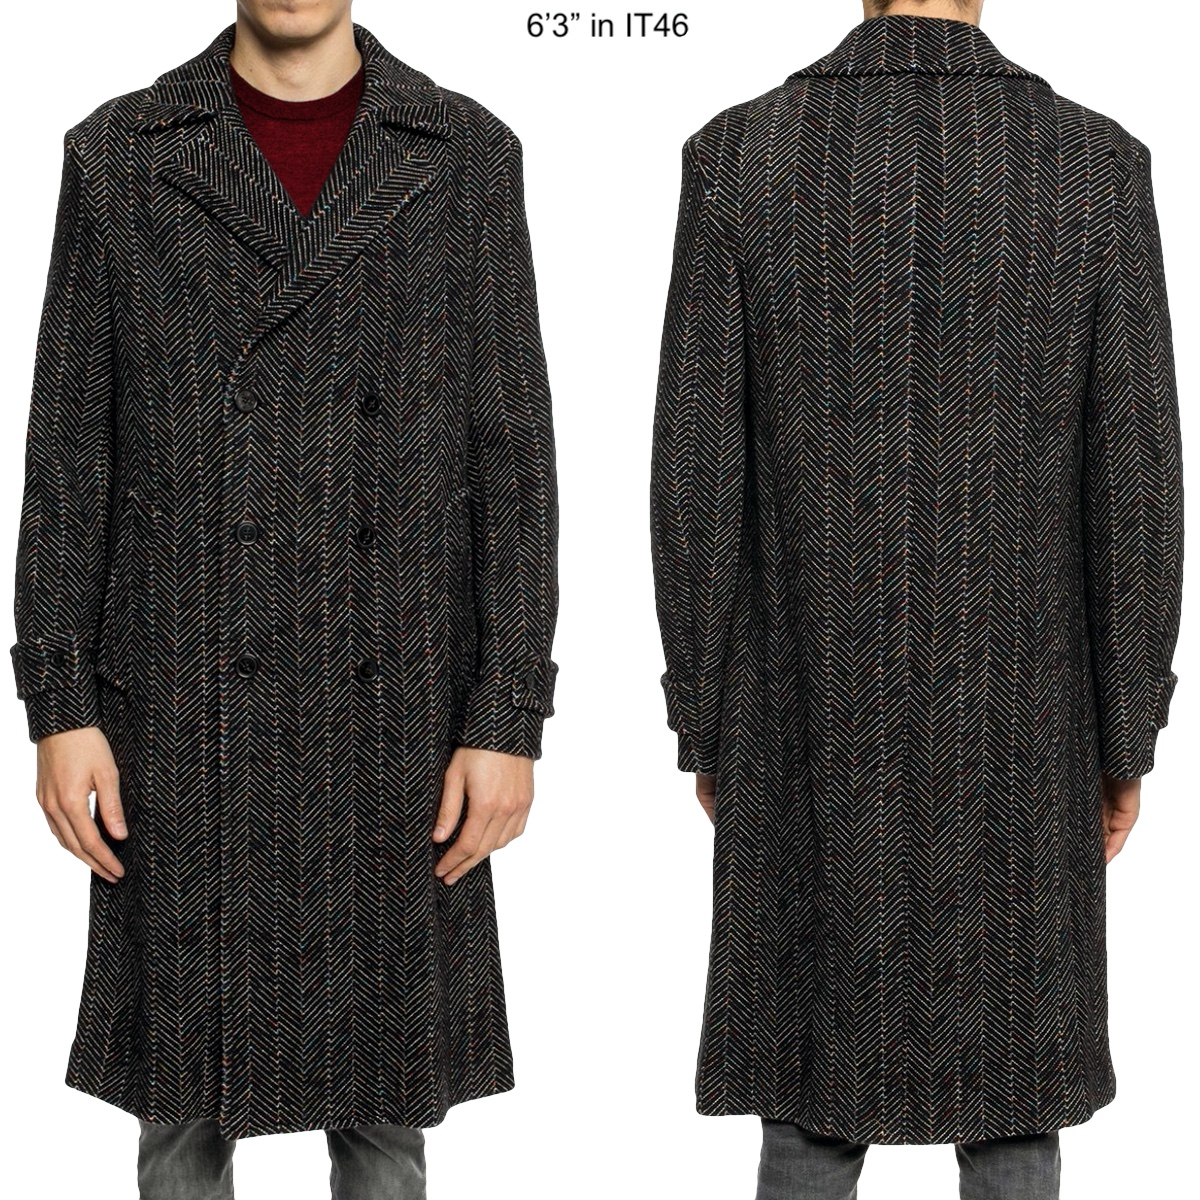 Missoni coat fit.jpg